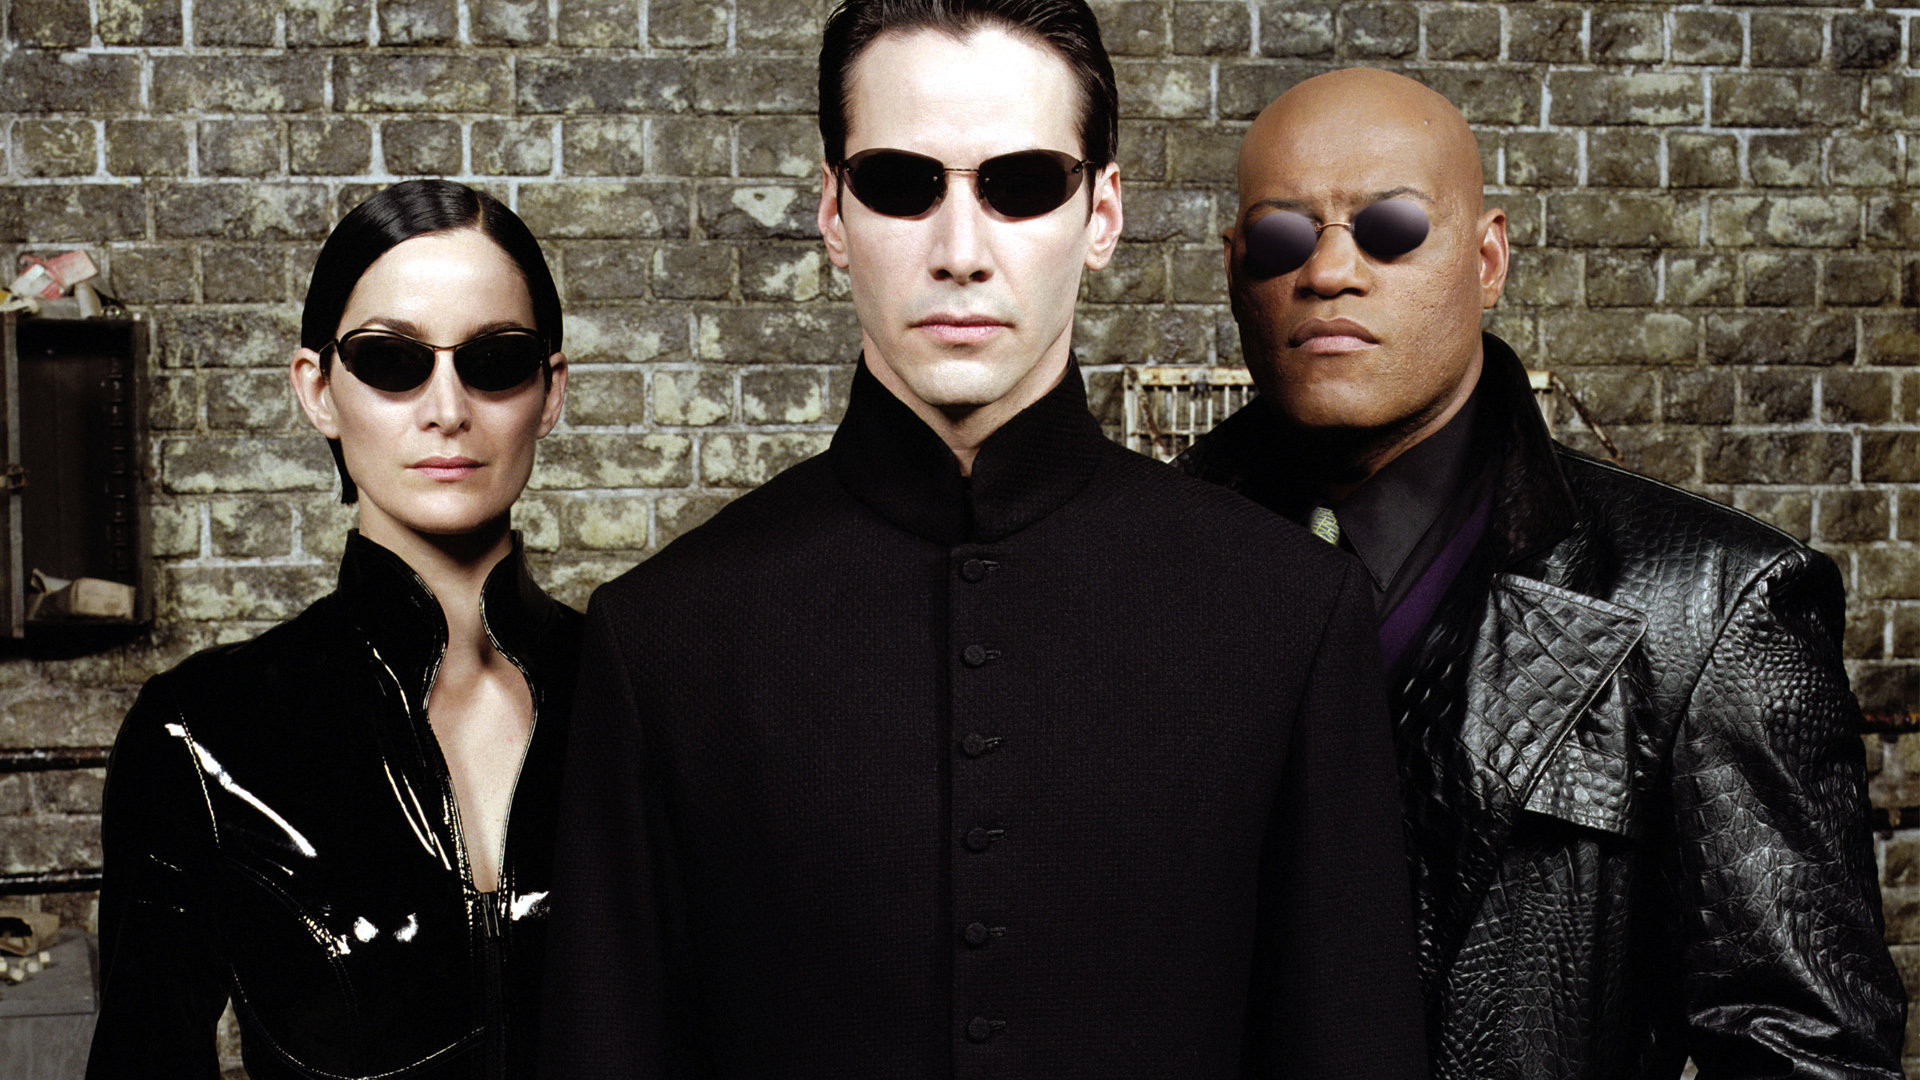 matrix movie download in hindi 300mb